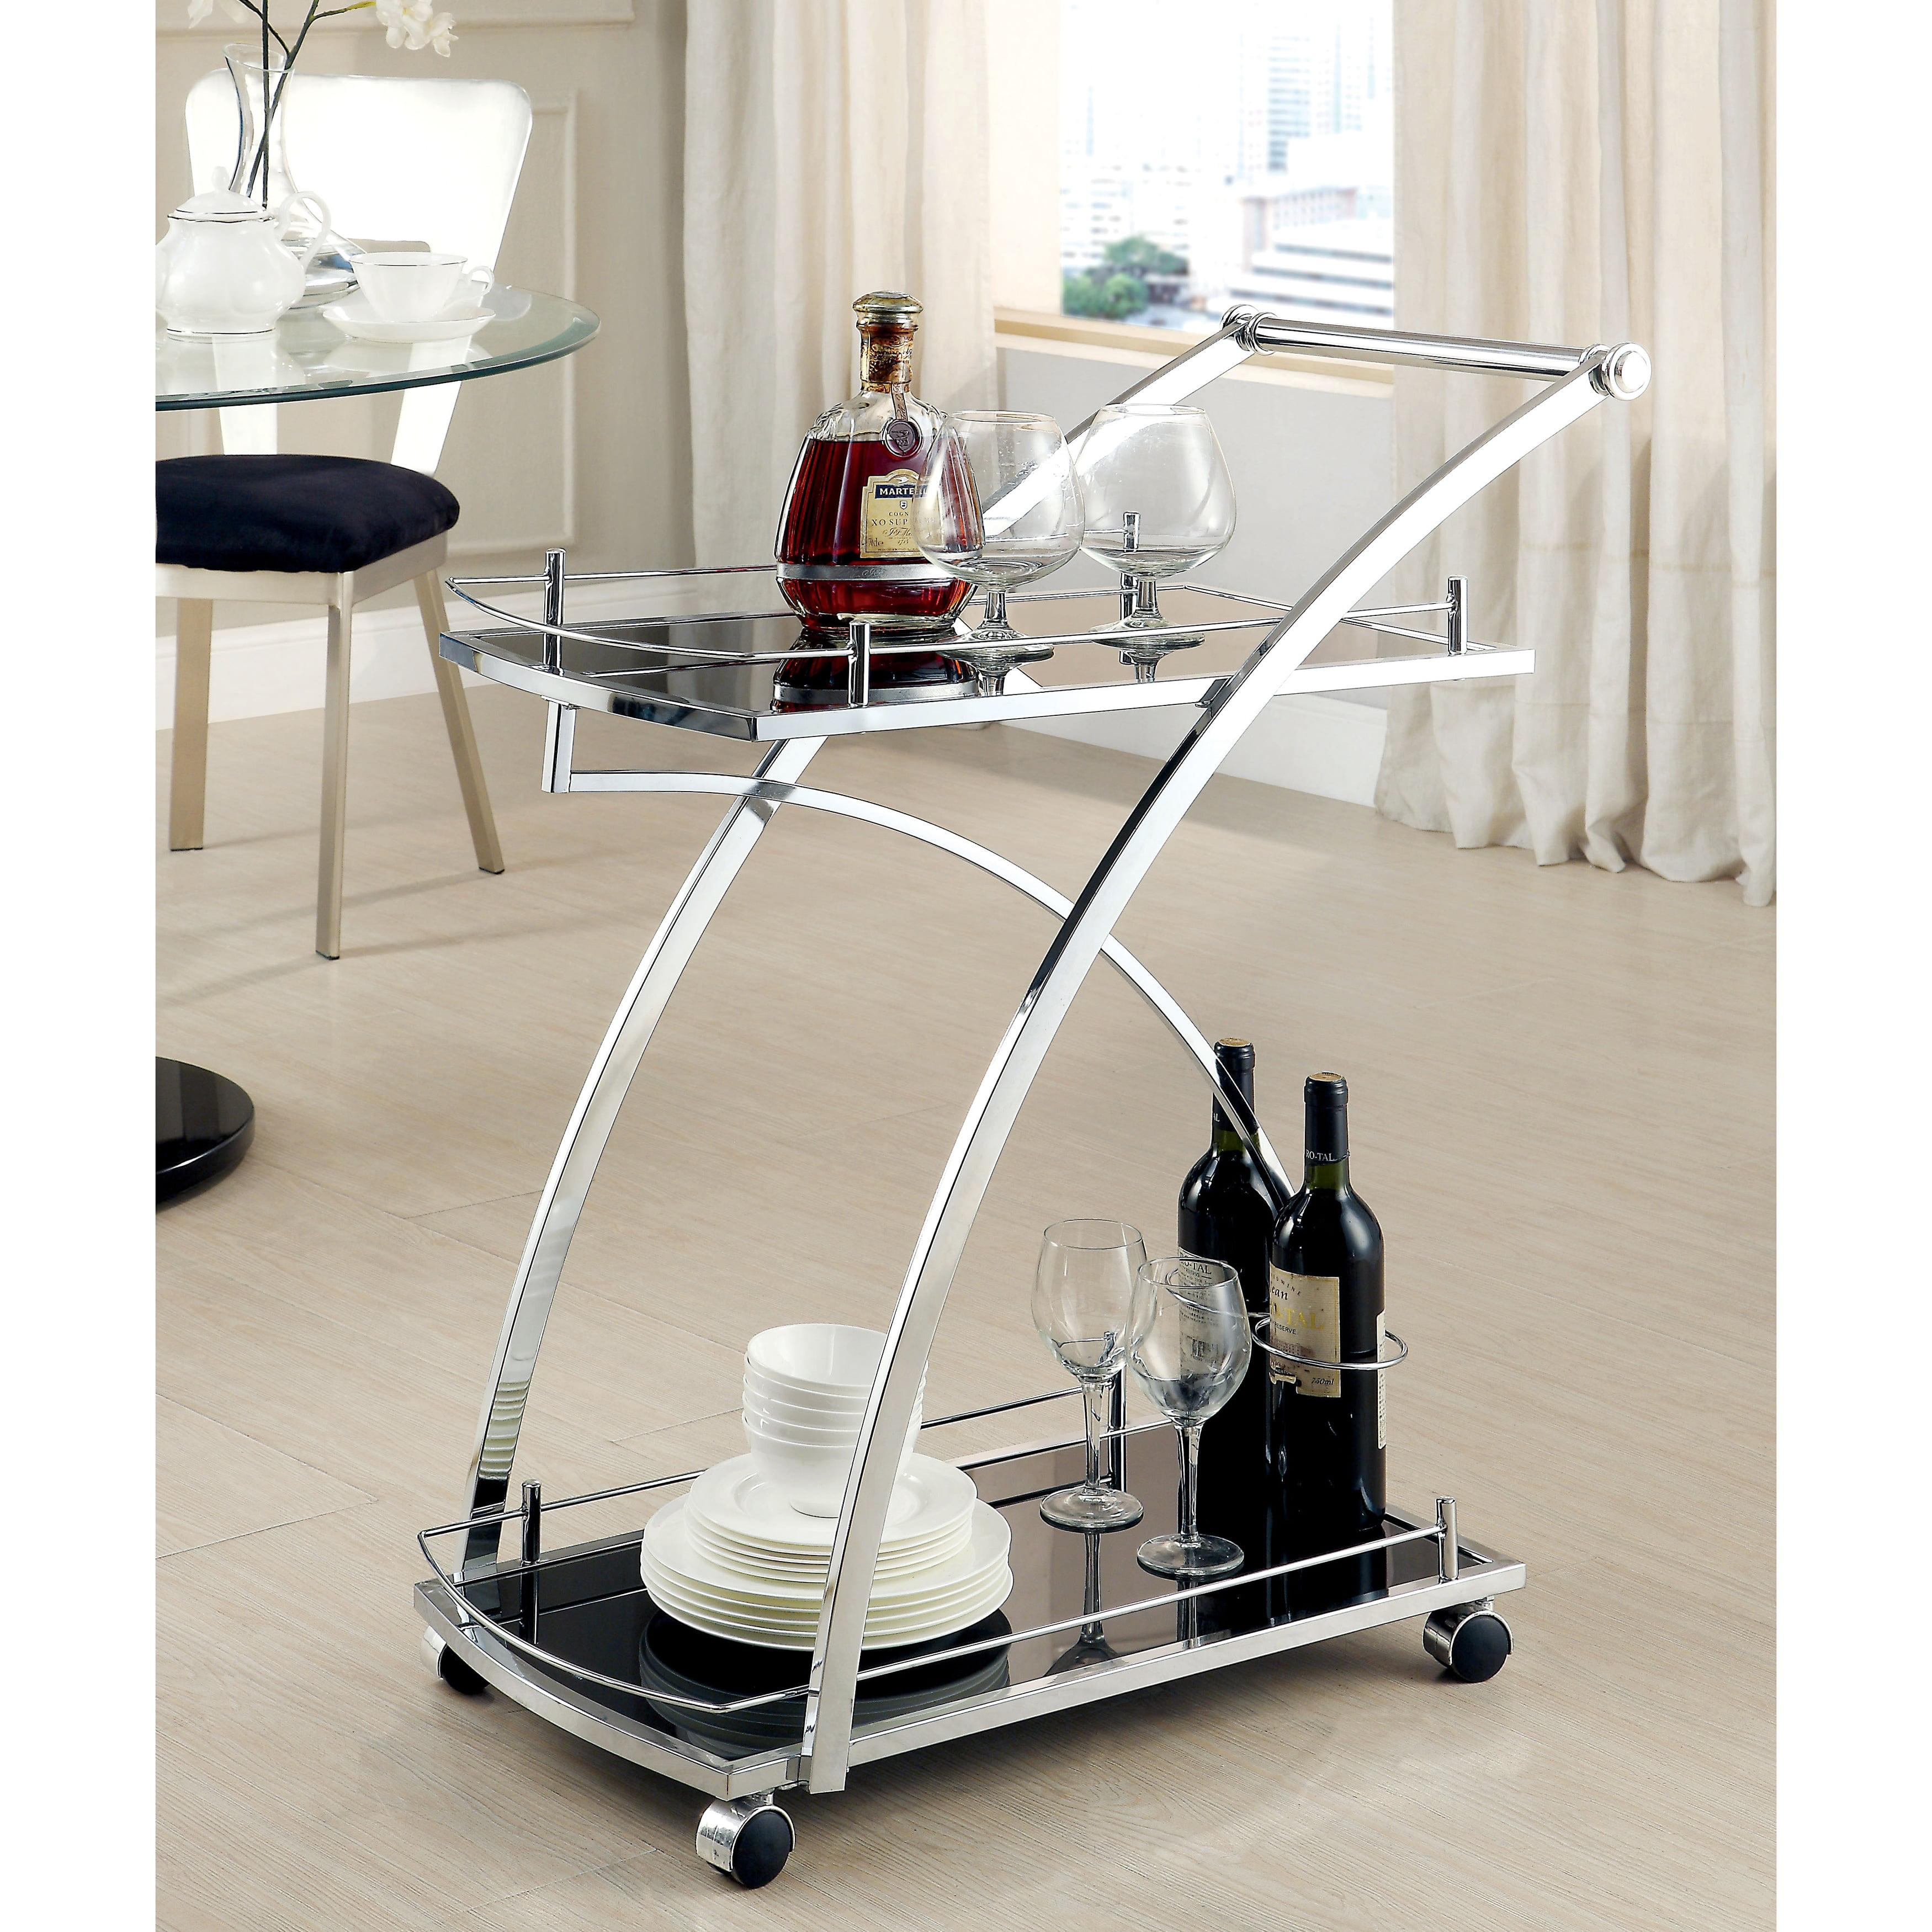 Furniture of America  Erwynn Contemporary Chrome 2-Shelf Serving Cart